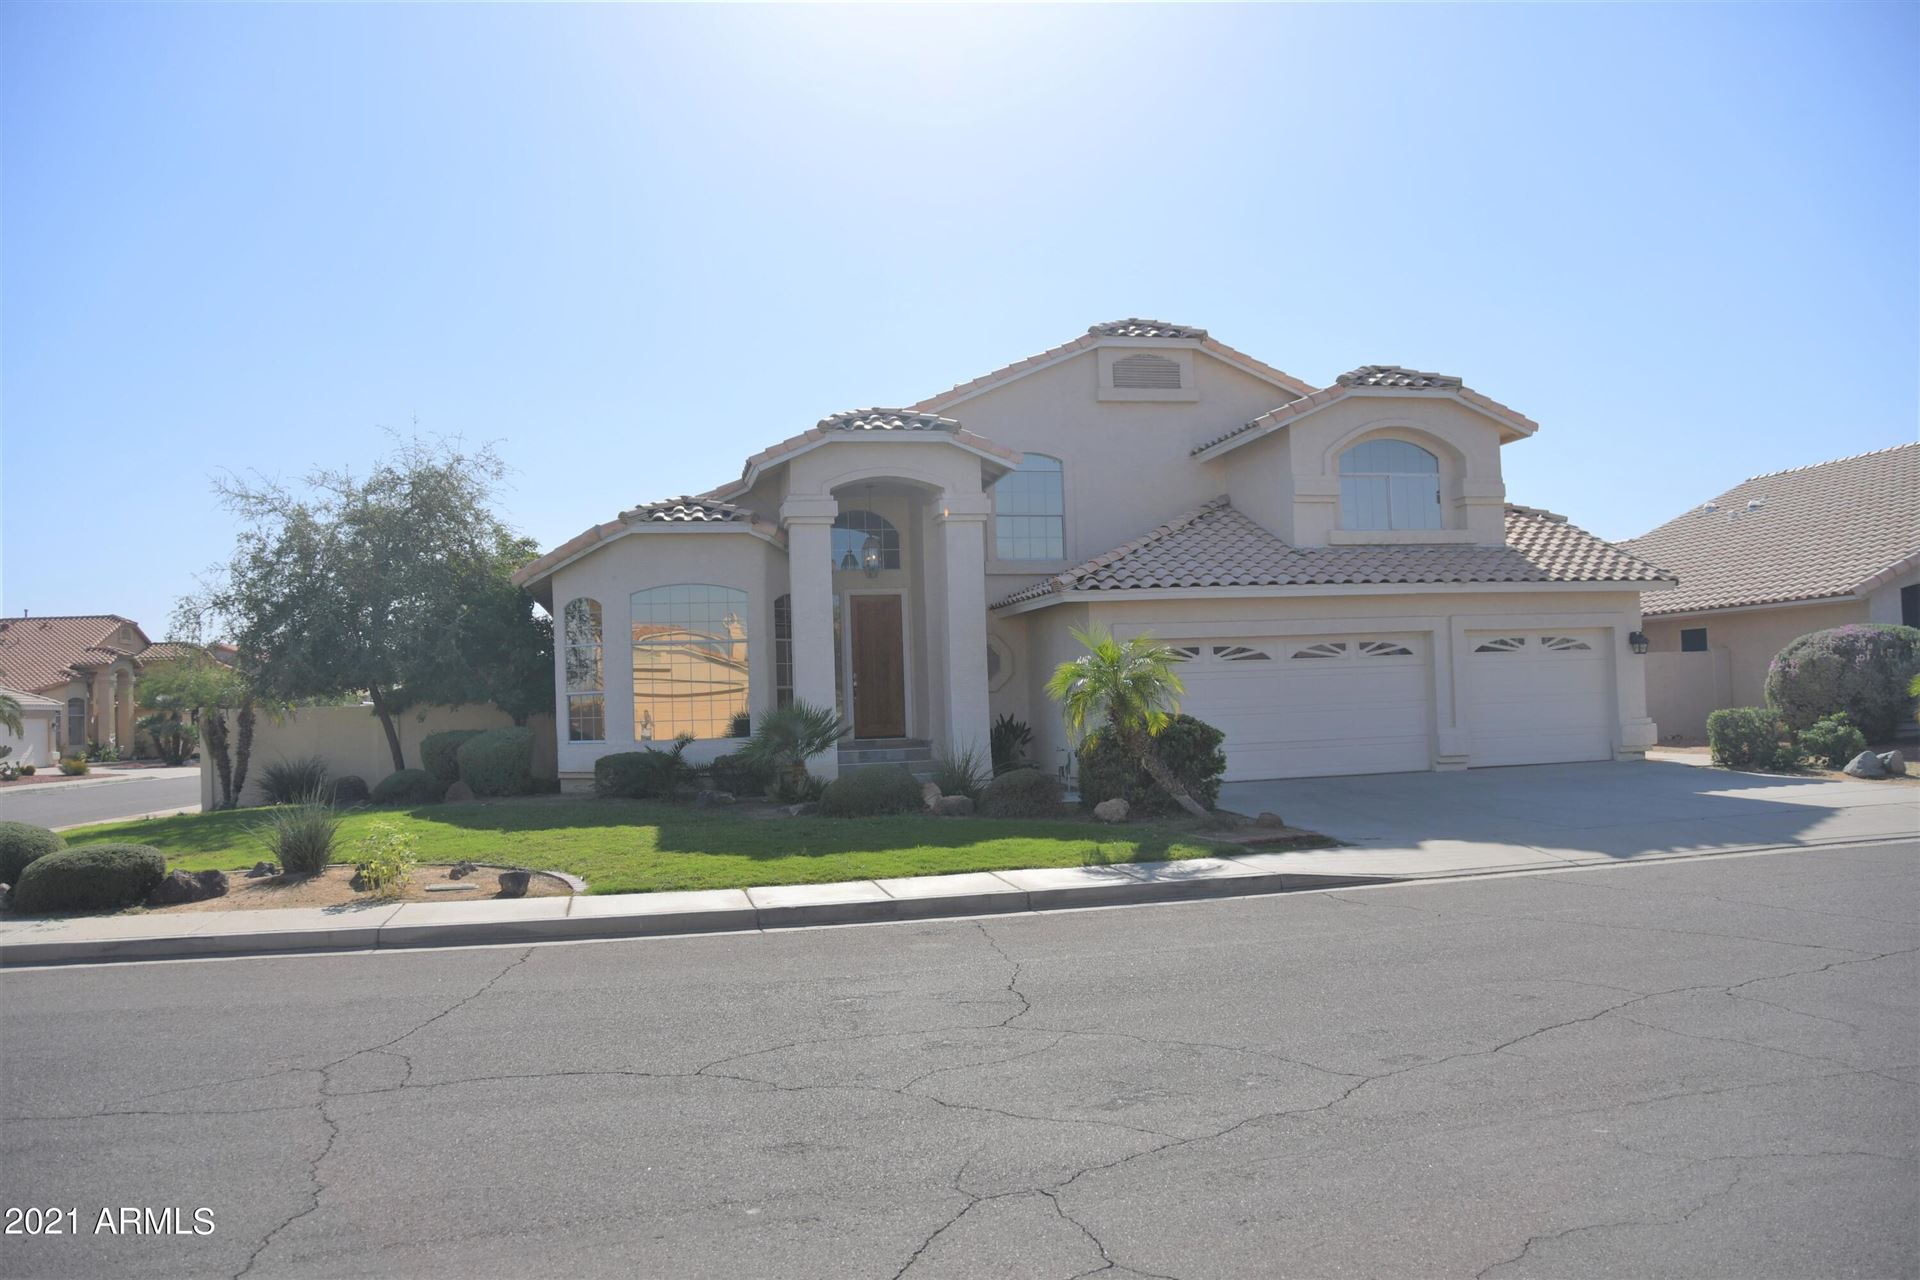 Photo of 12335 W LEWIS Avenue, Avondale, AZ 85392 (MLS # 6306547)